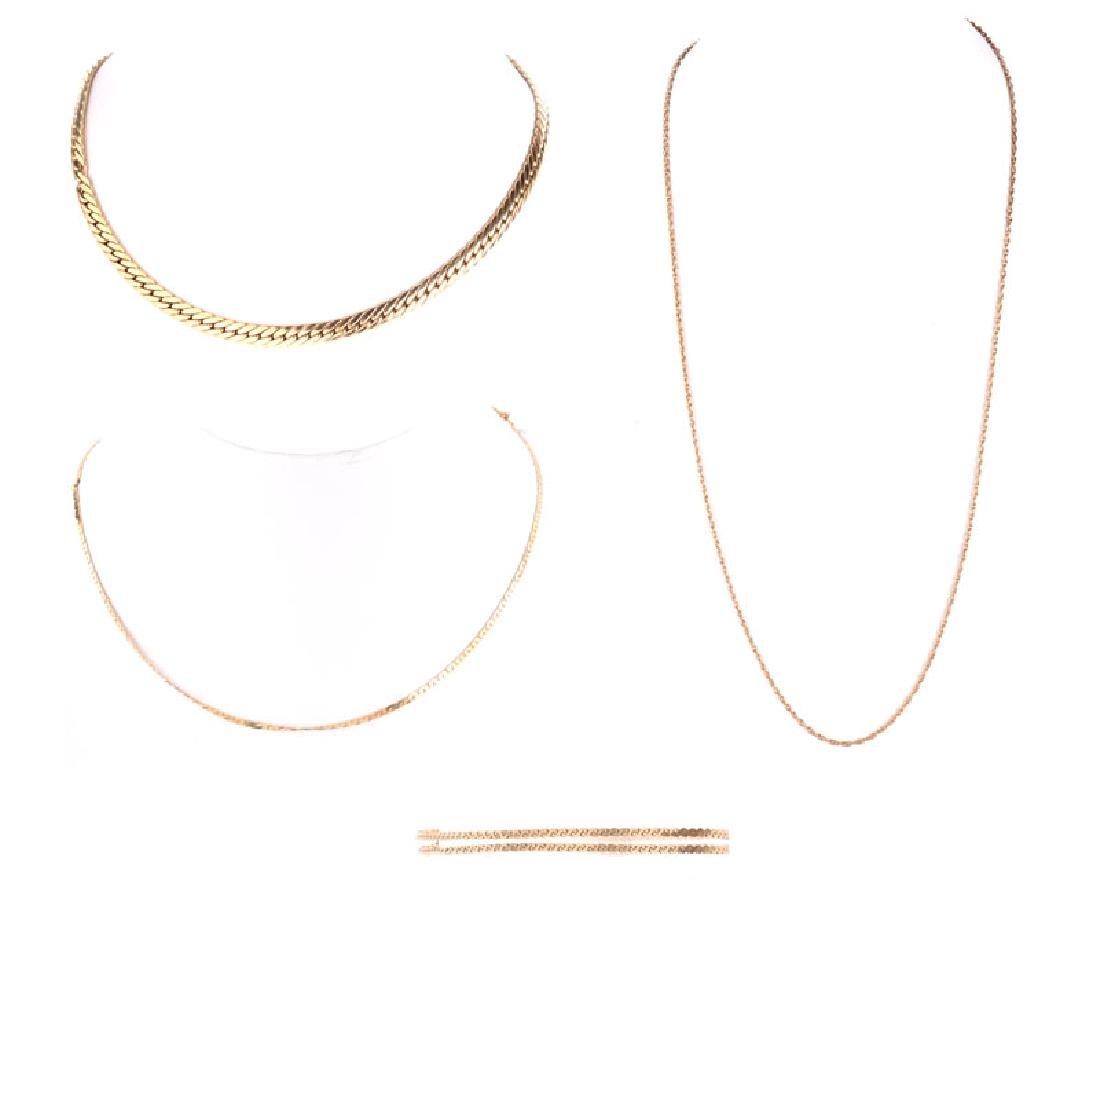 Three (3) Vintage 14 Karat Yellow Gold Link Necklaces